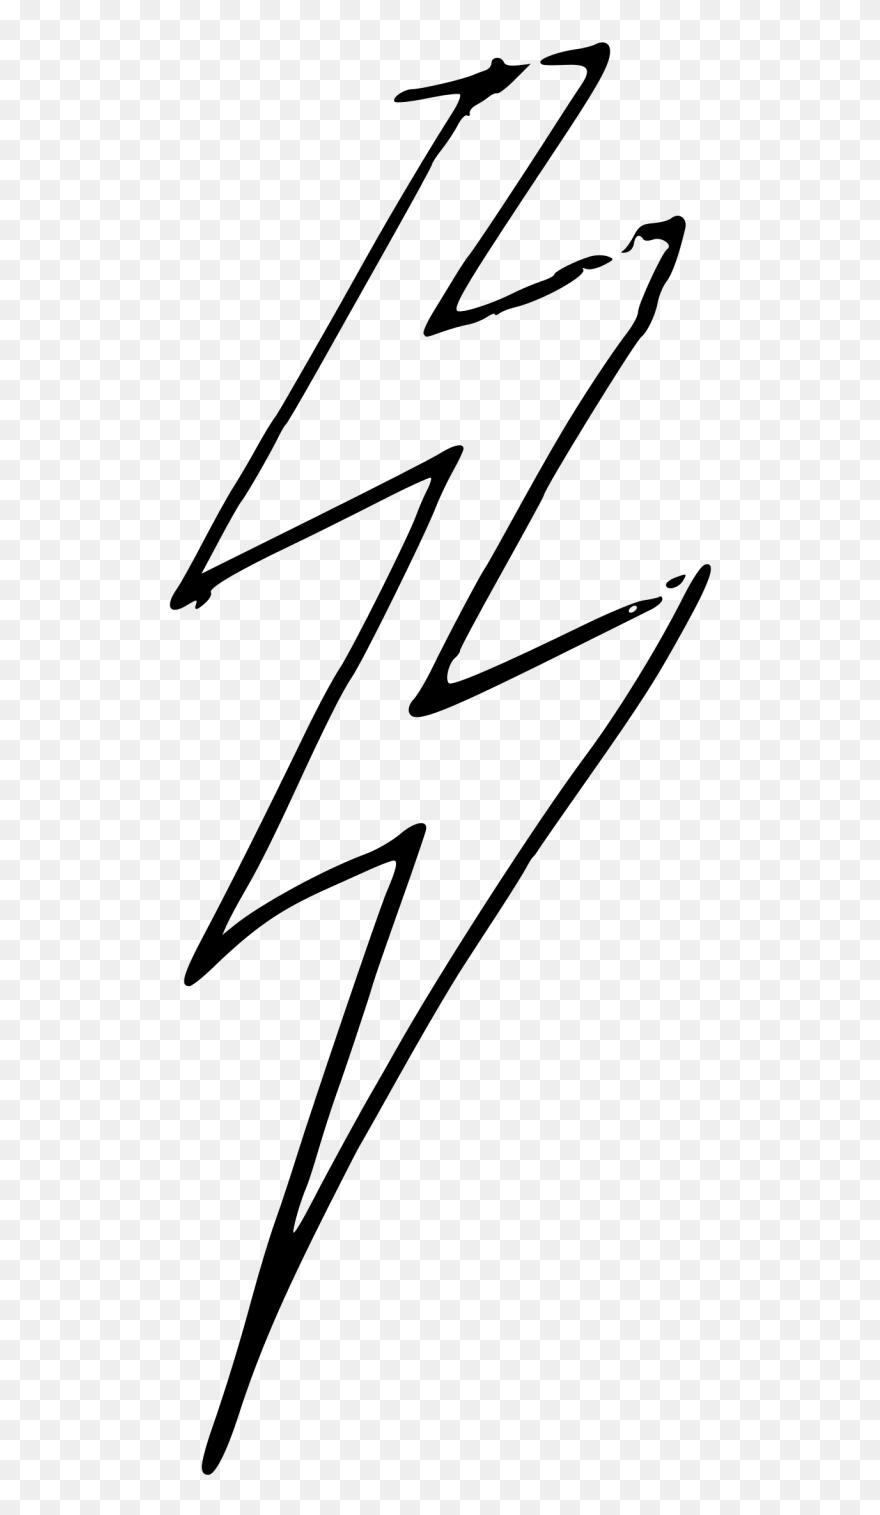 Lightning Bolt Clipart Lightning Bolt Gif Png Transparent Png 204190 Pinclipart